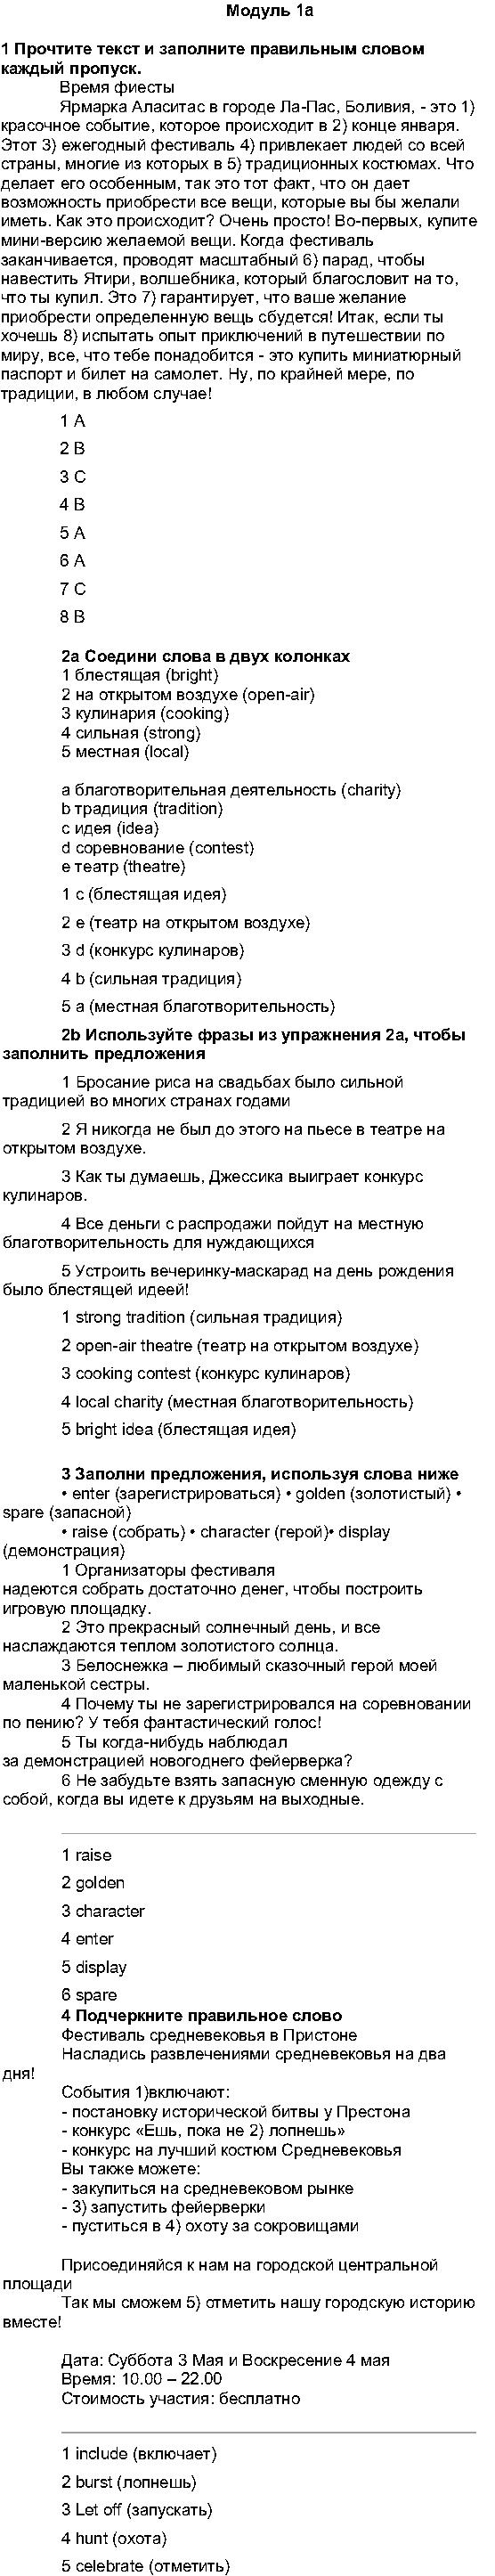 стр. 4 - решебник №2